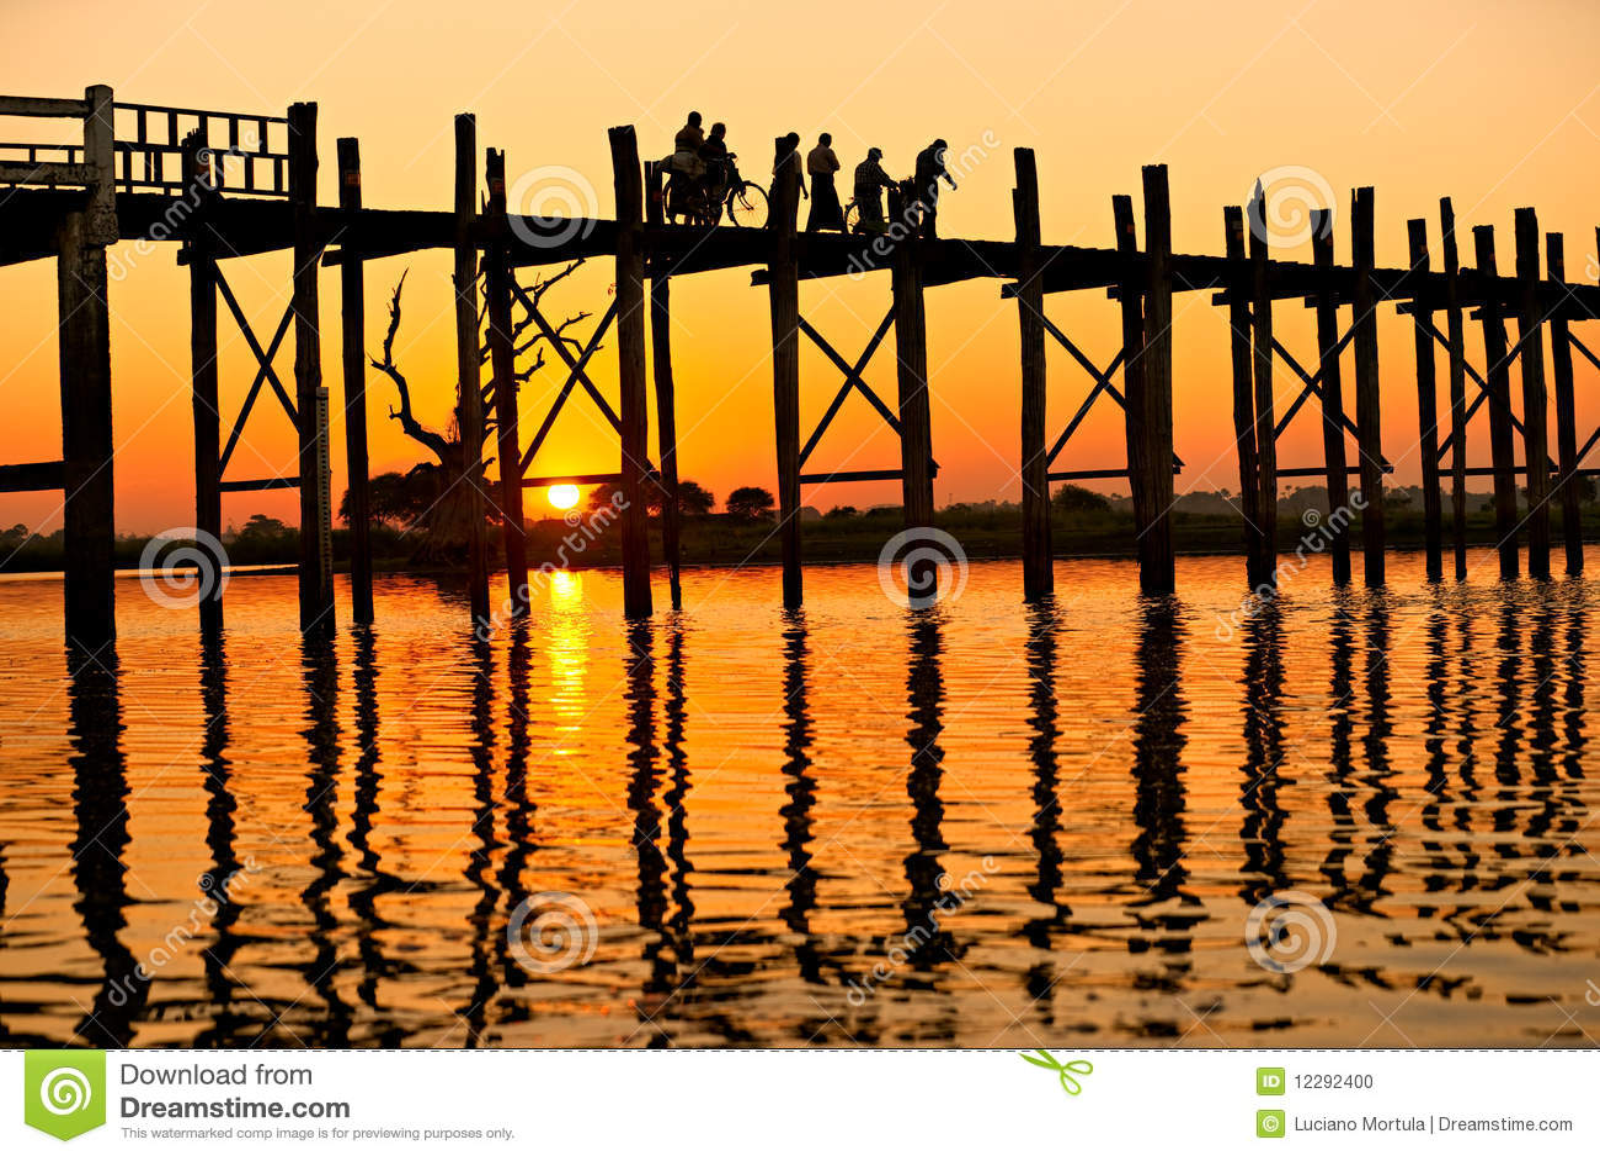 мост mandalay myanmar u bein amarapura